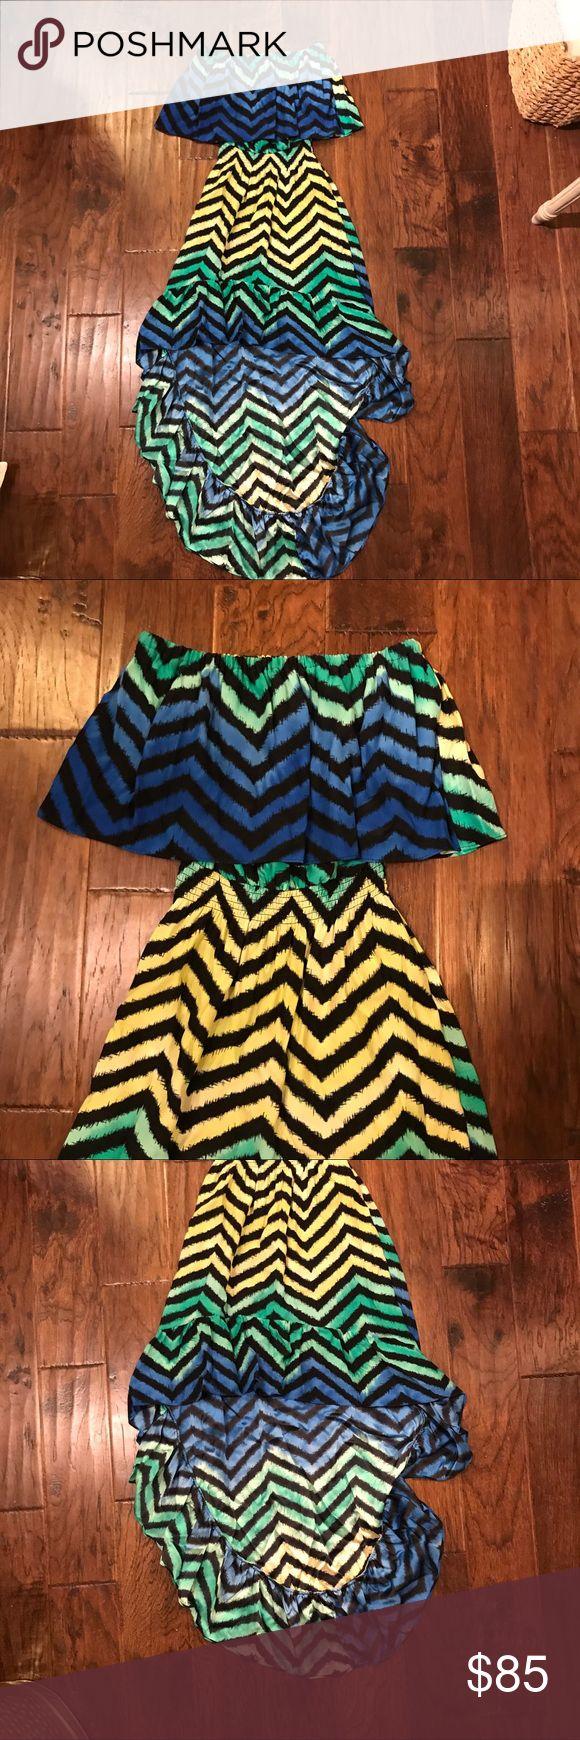 Parker High Low Strapless Maxi Dress Worn twice, 100% silk, high low chevron Maxi dress Parker Dresses High Low